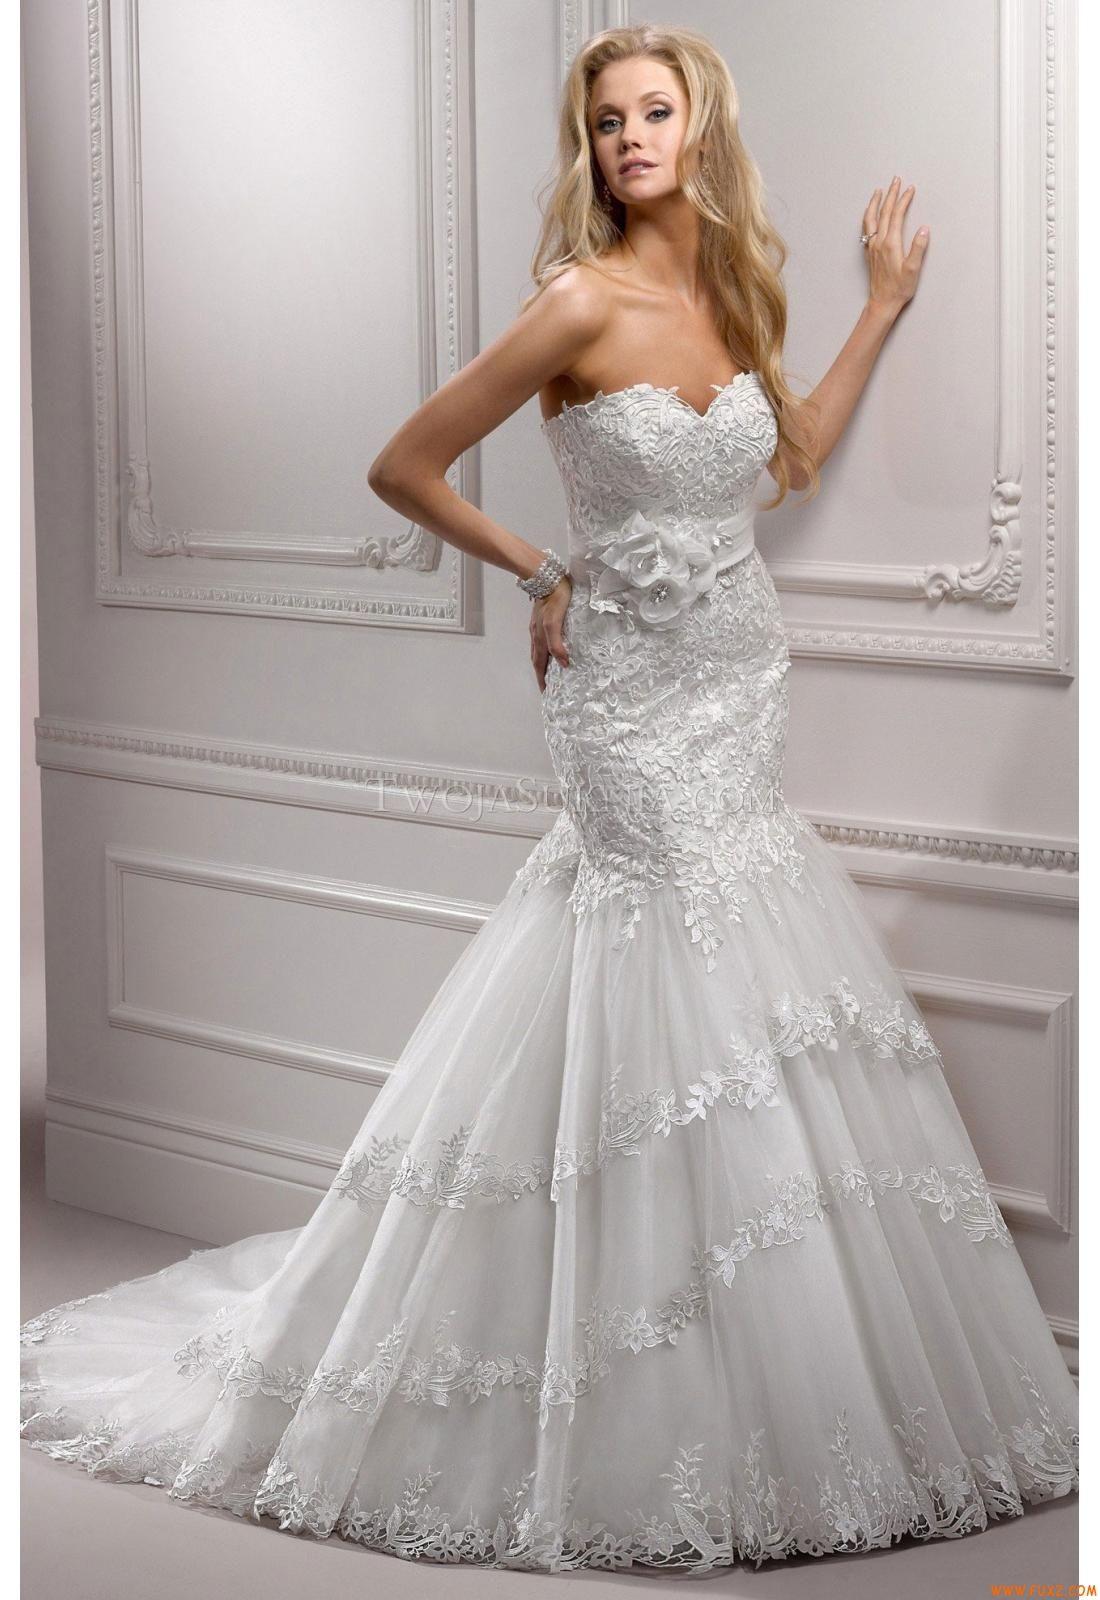 Dropped waist wedding dress  Wedding Dresses Maggie Sottero Mandy Symphony  wedding dresses